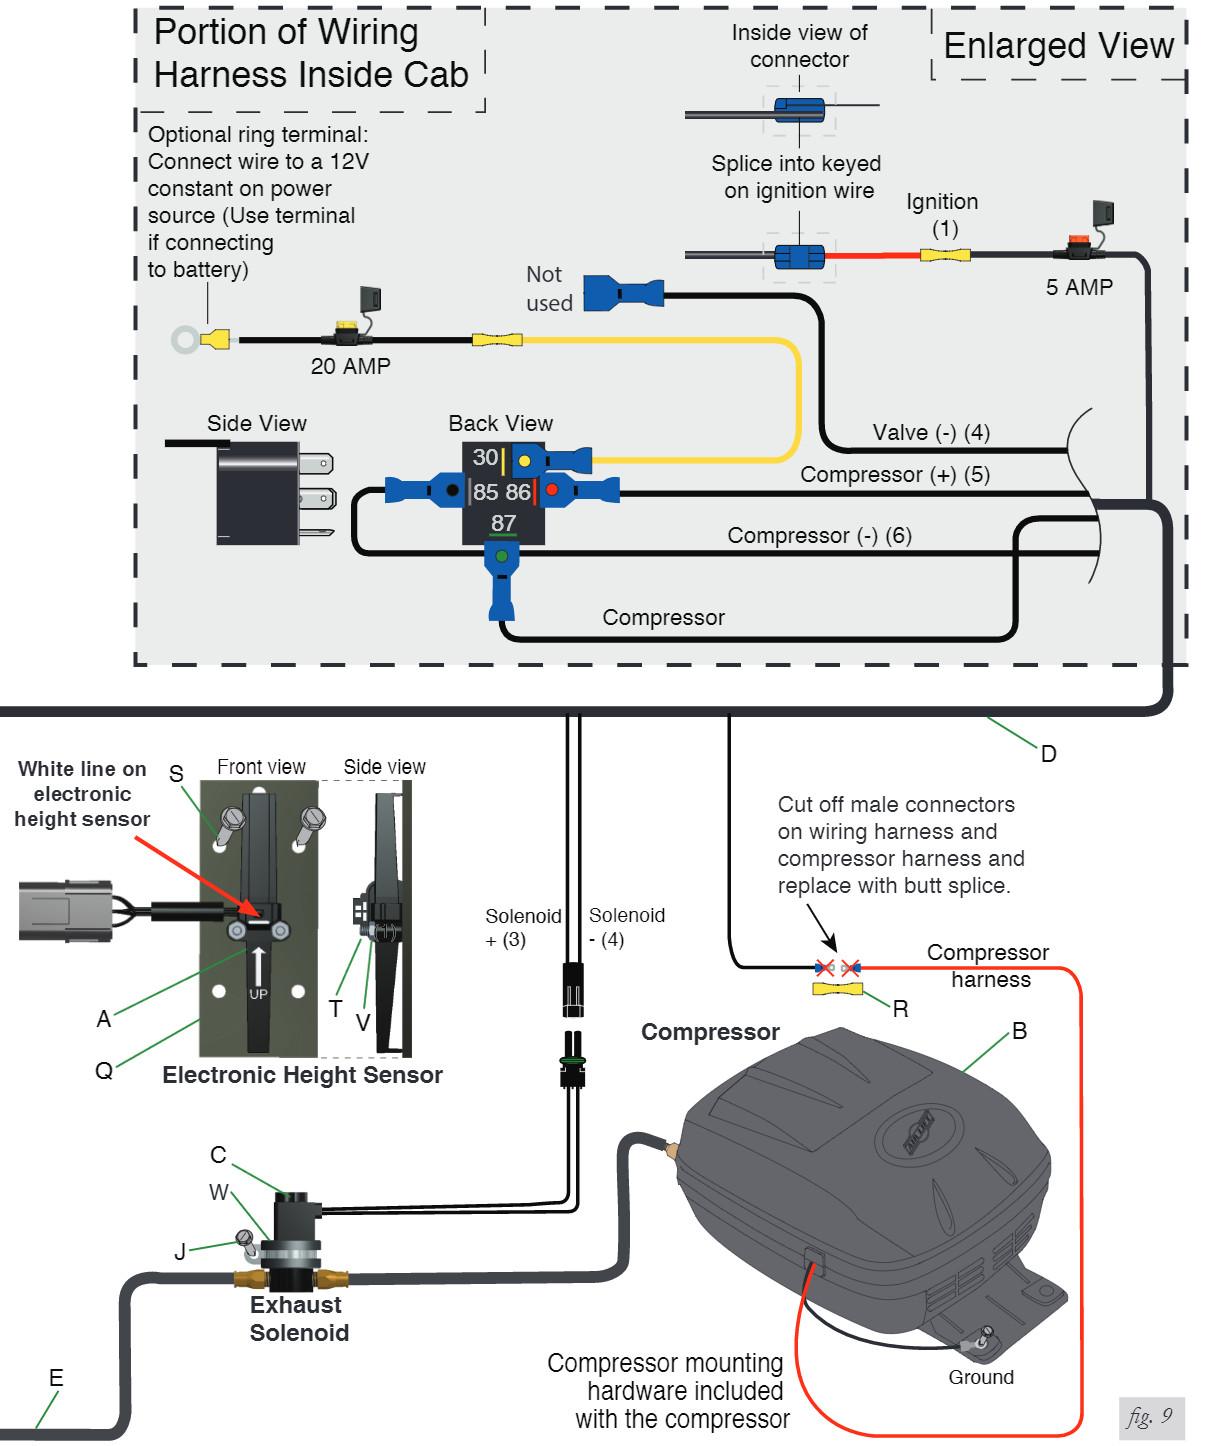 Ridetech Air Valve Wiring Diagram Diagrams Schematic Water Pump Bag Compressor